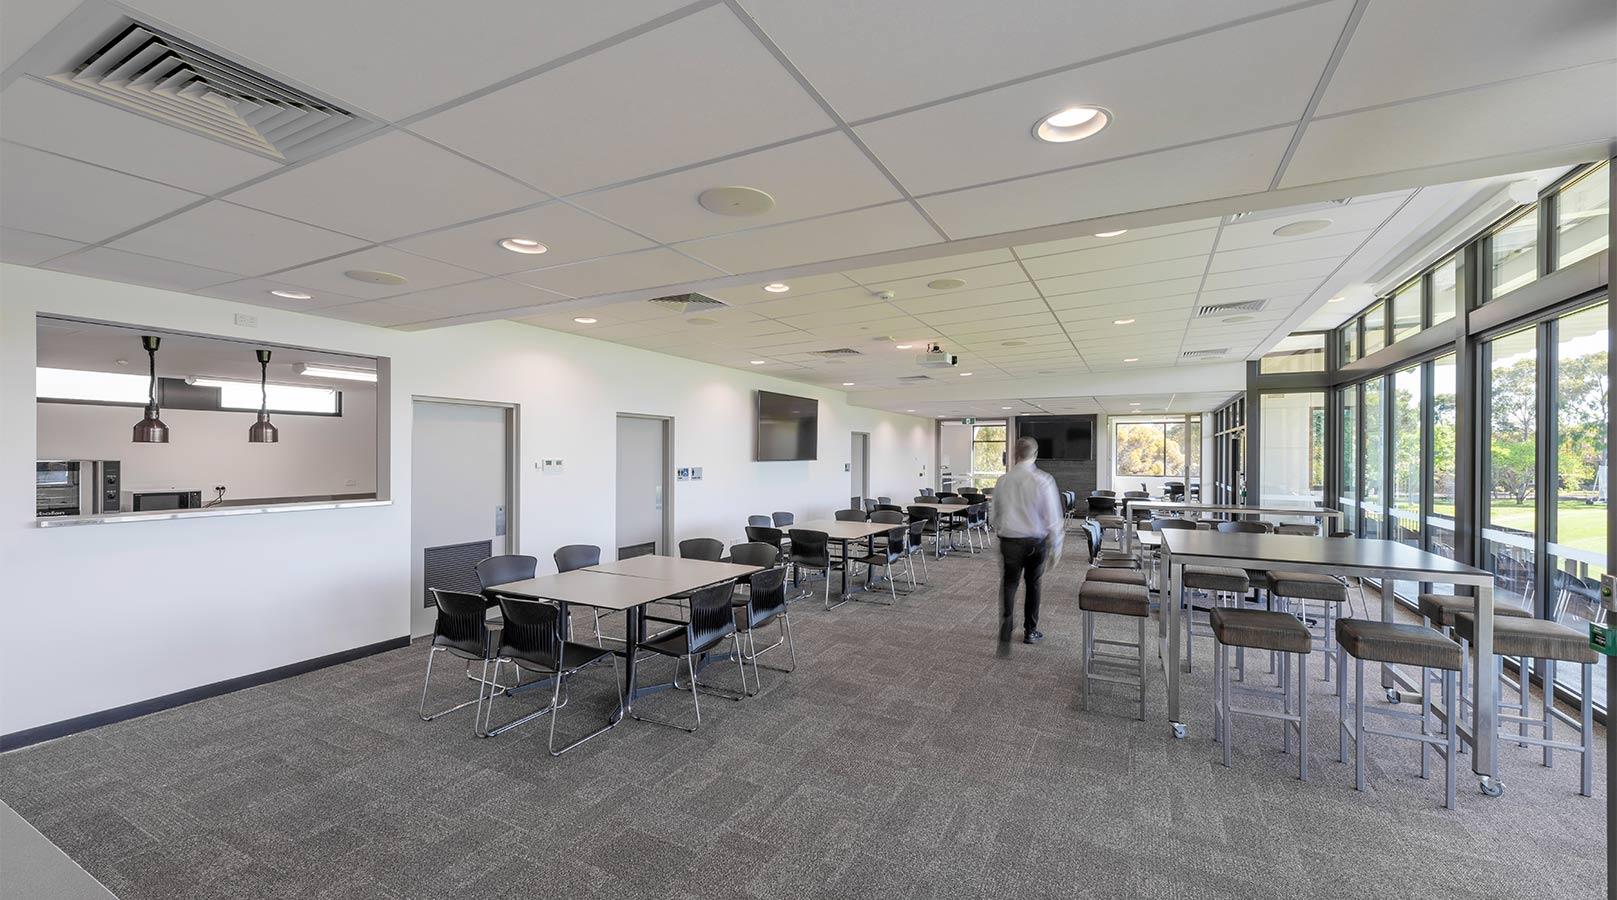 schiavello construction adelaide goodwood oval sport stadium football cricket cafeteria